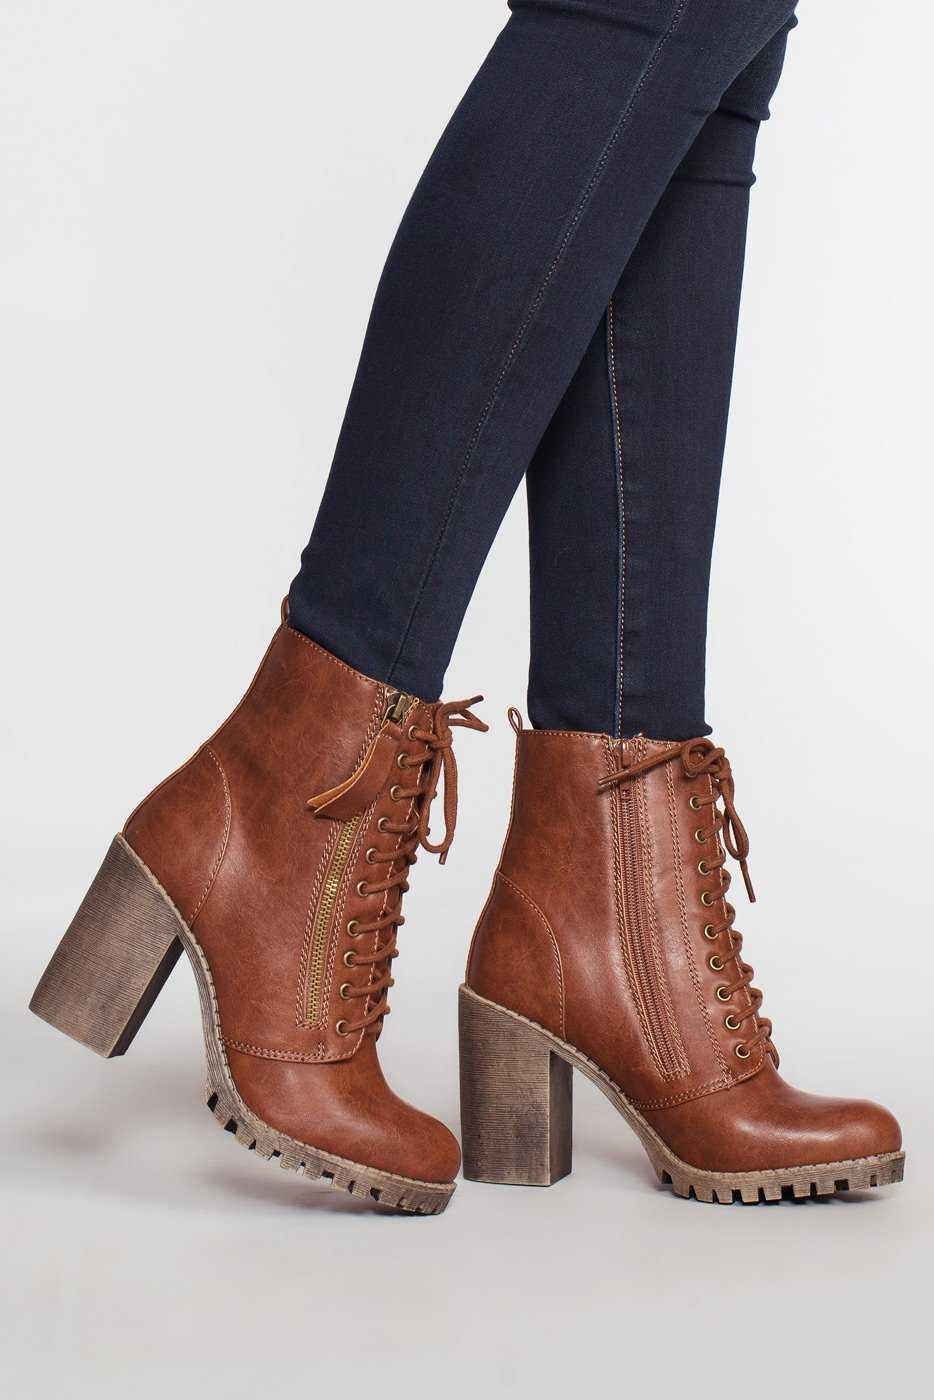 Fortune Dynamic Edge Of Life Boots - Tan  - C1647 Tan 6.5